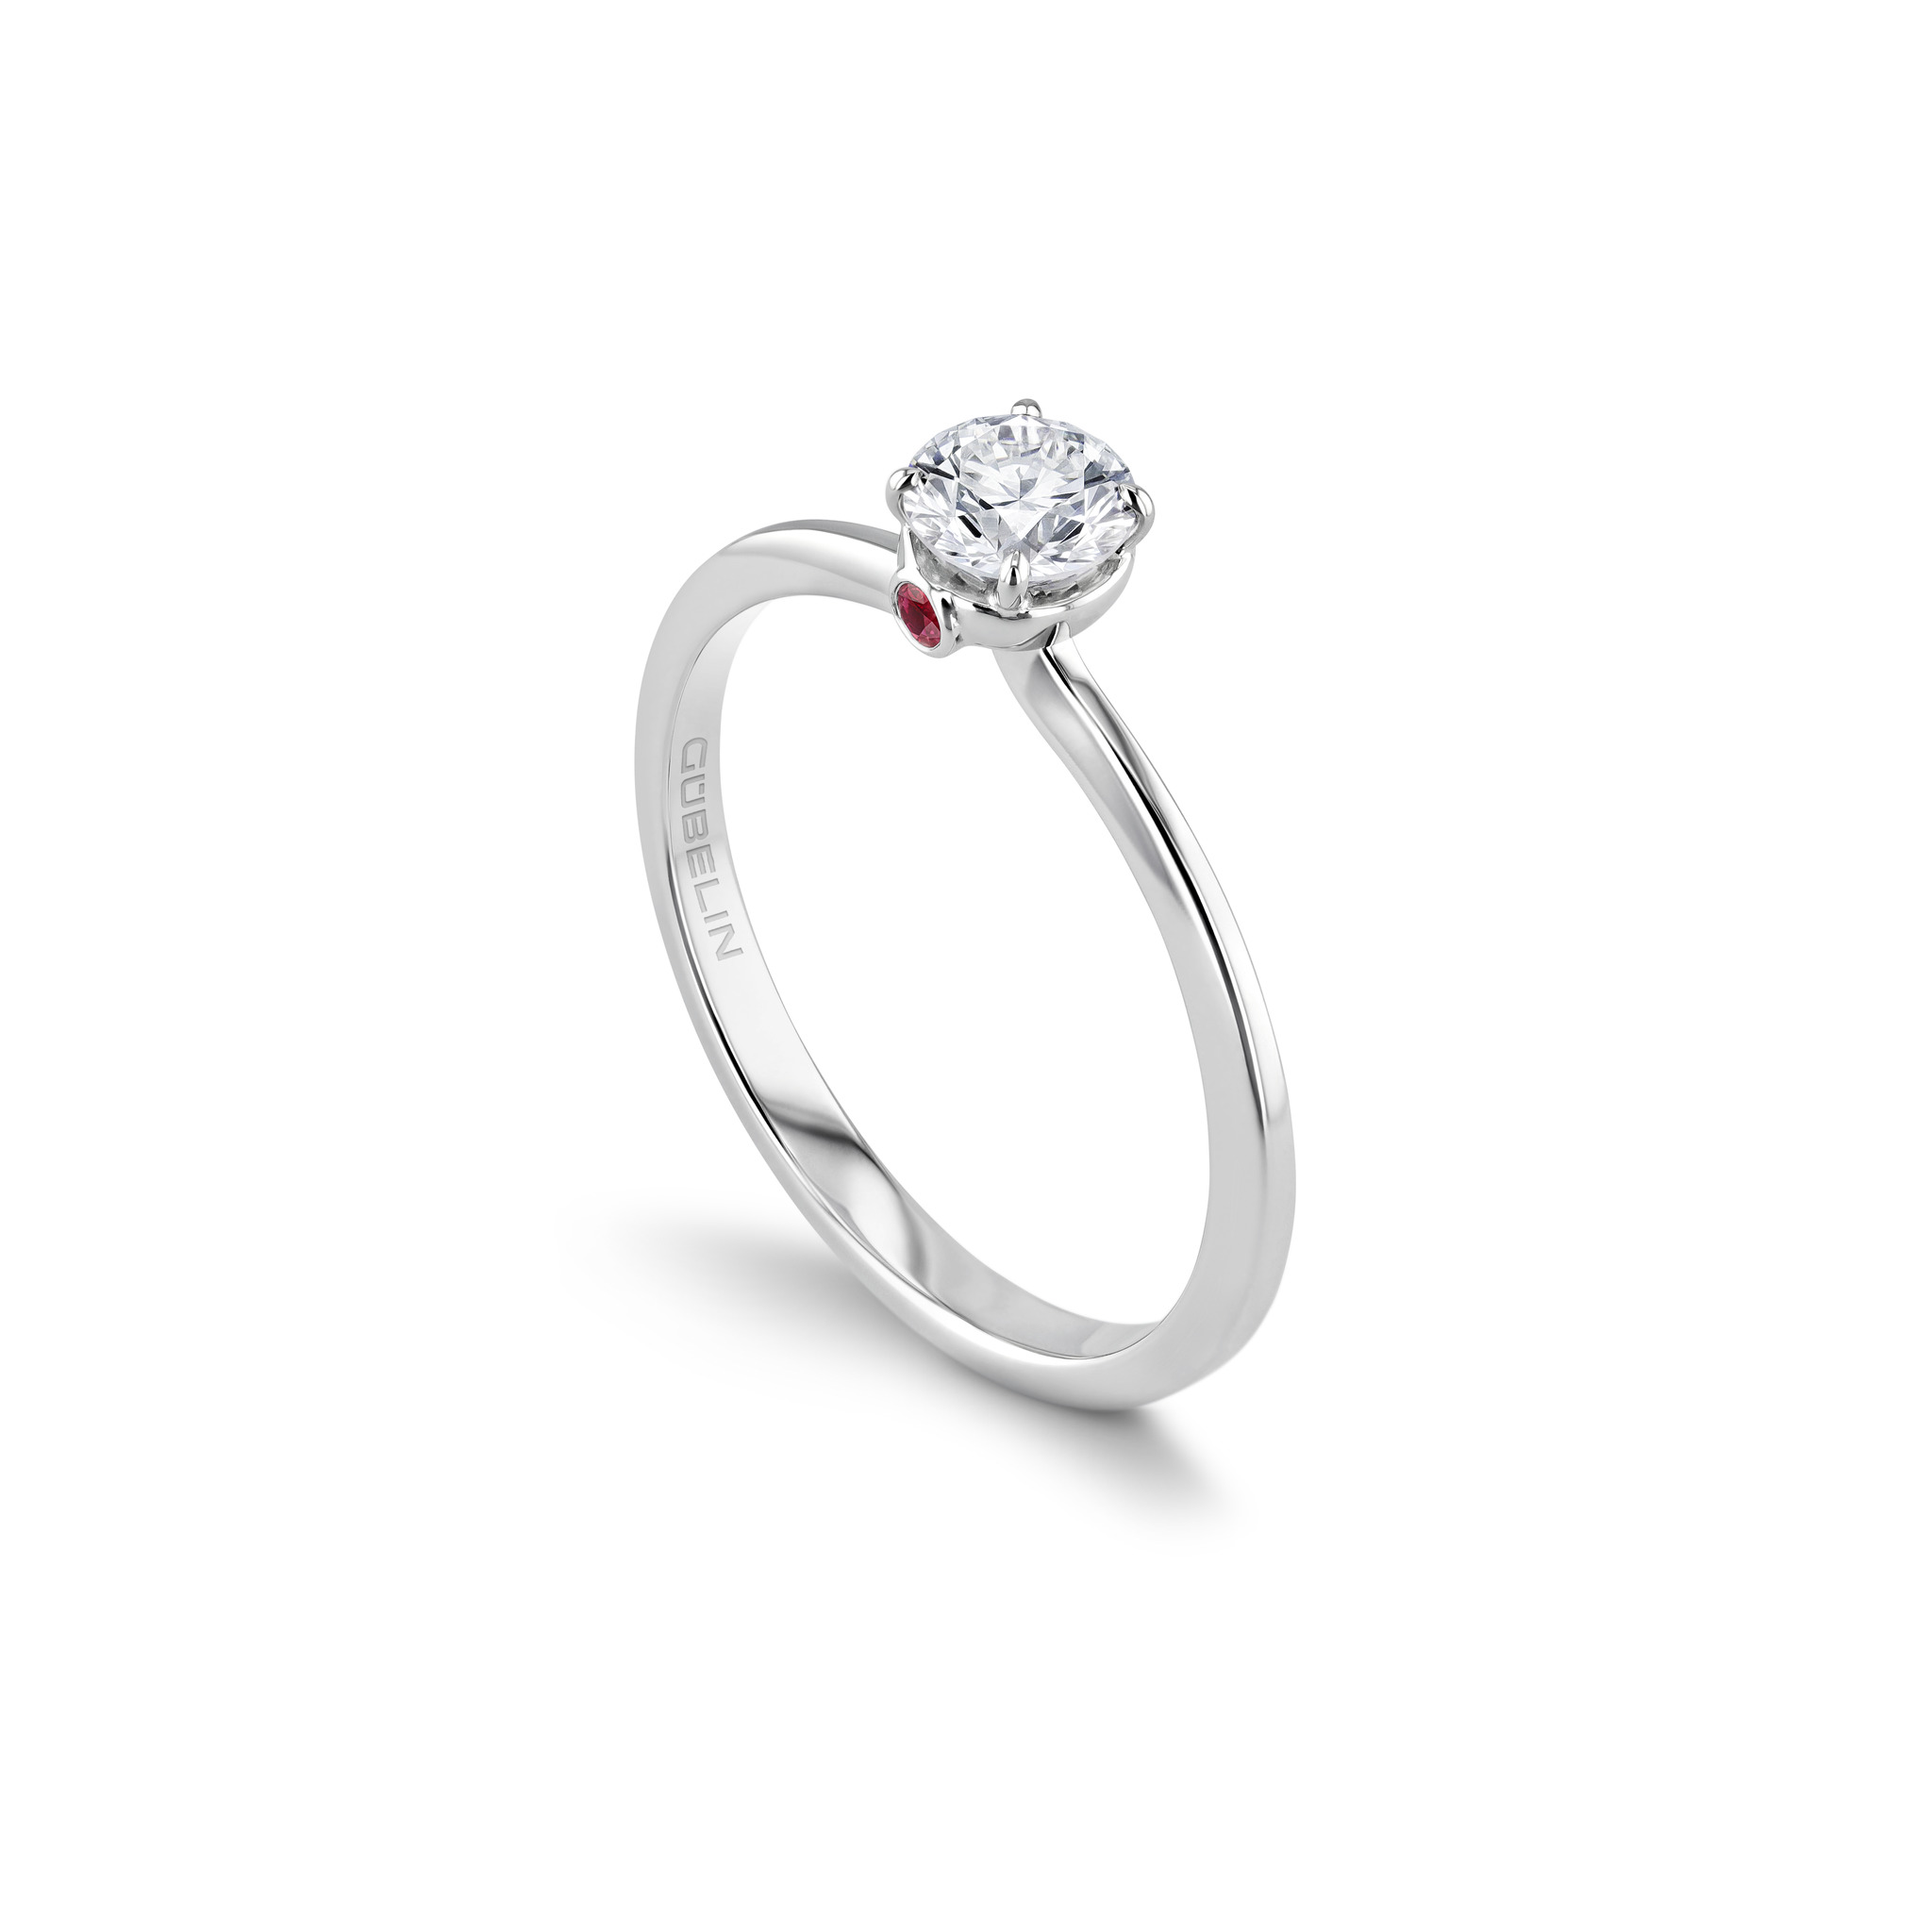 Solitär Ring mit Diamanten